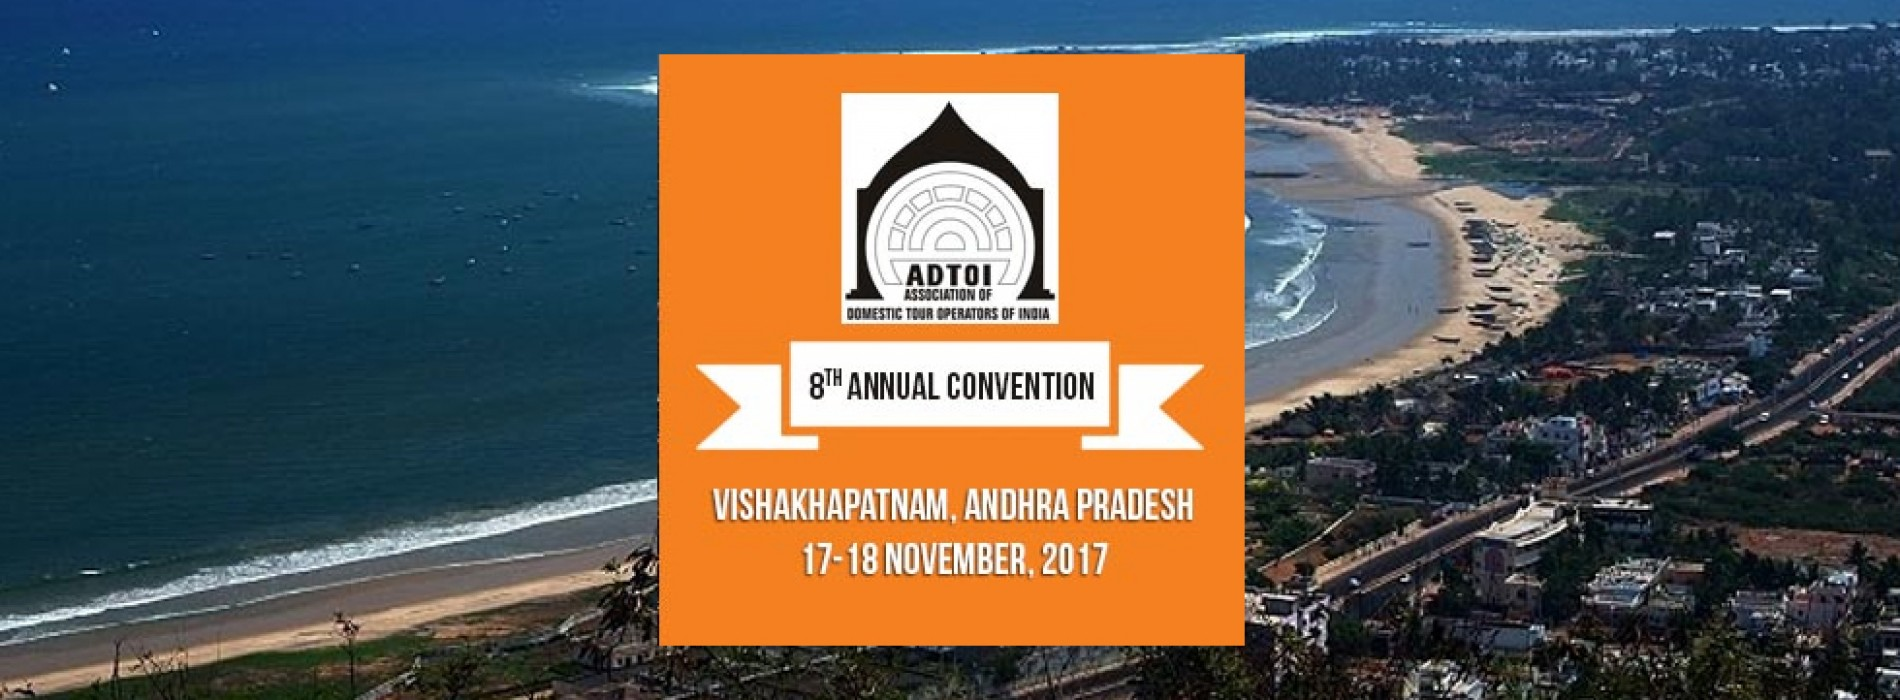 8th ADTOI Annual Convention-cum-Exhibition 2017 at Novotel, Varun Beach, Visakhapatnam on 17/18 November 2017